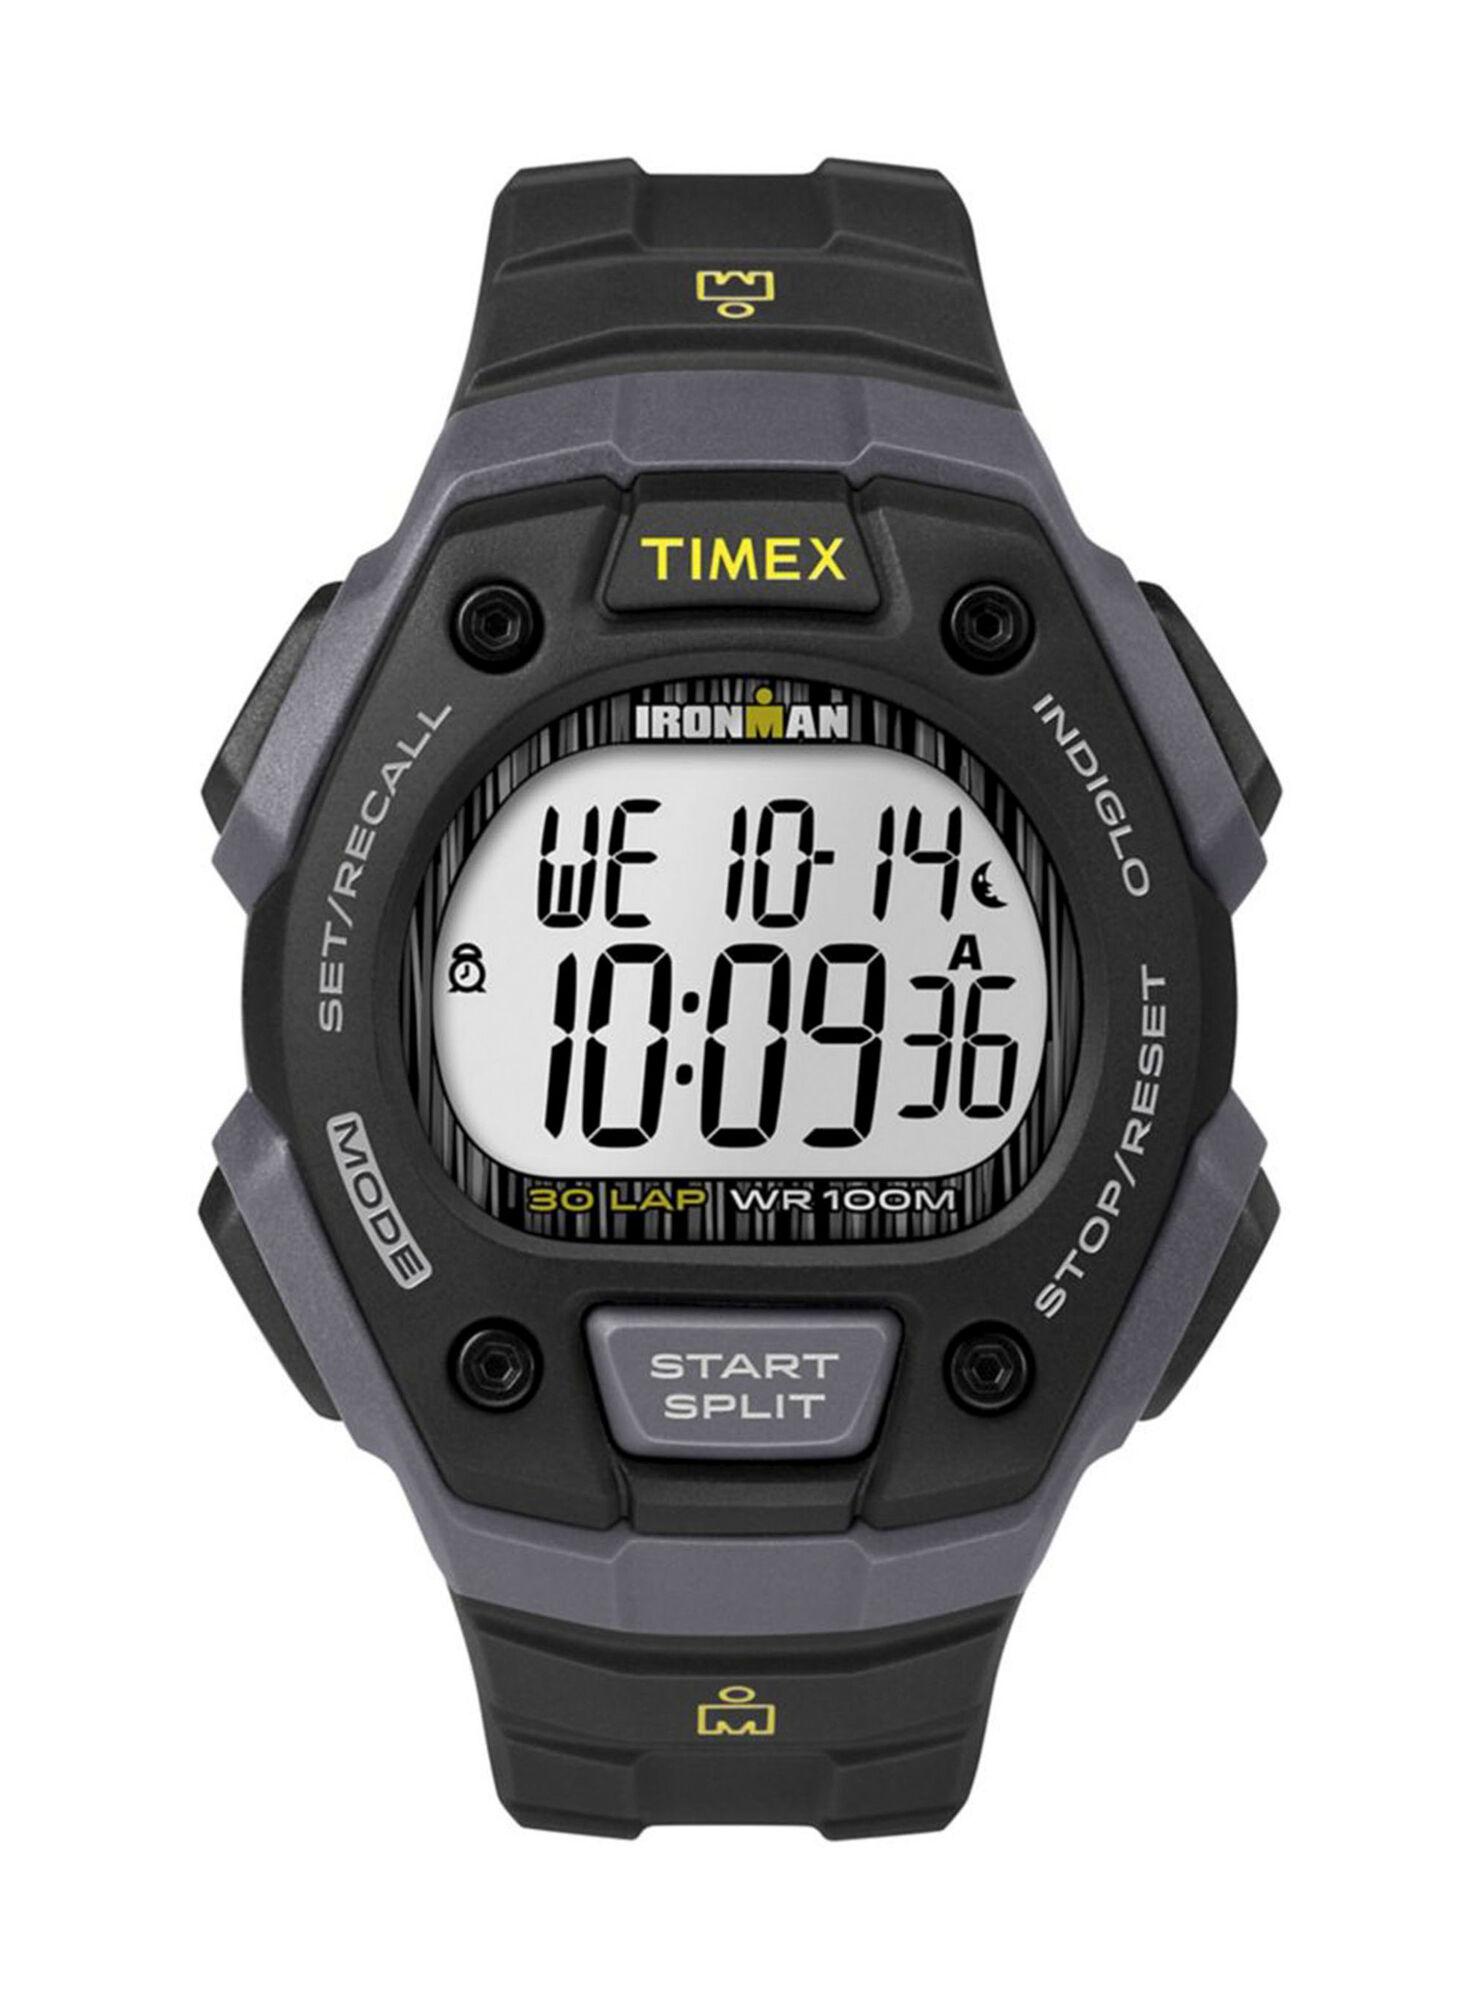 9dd74c8ad202 Reloj Análogo Digital Timex Sport Ironman Hombre en Relojes